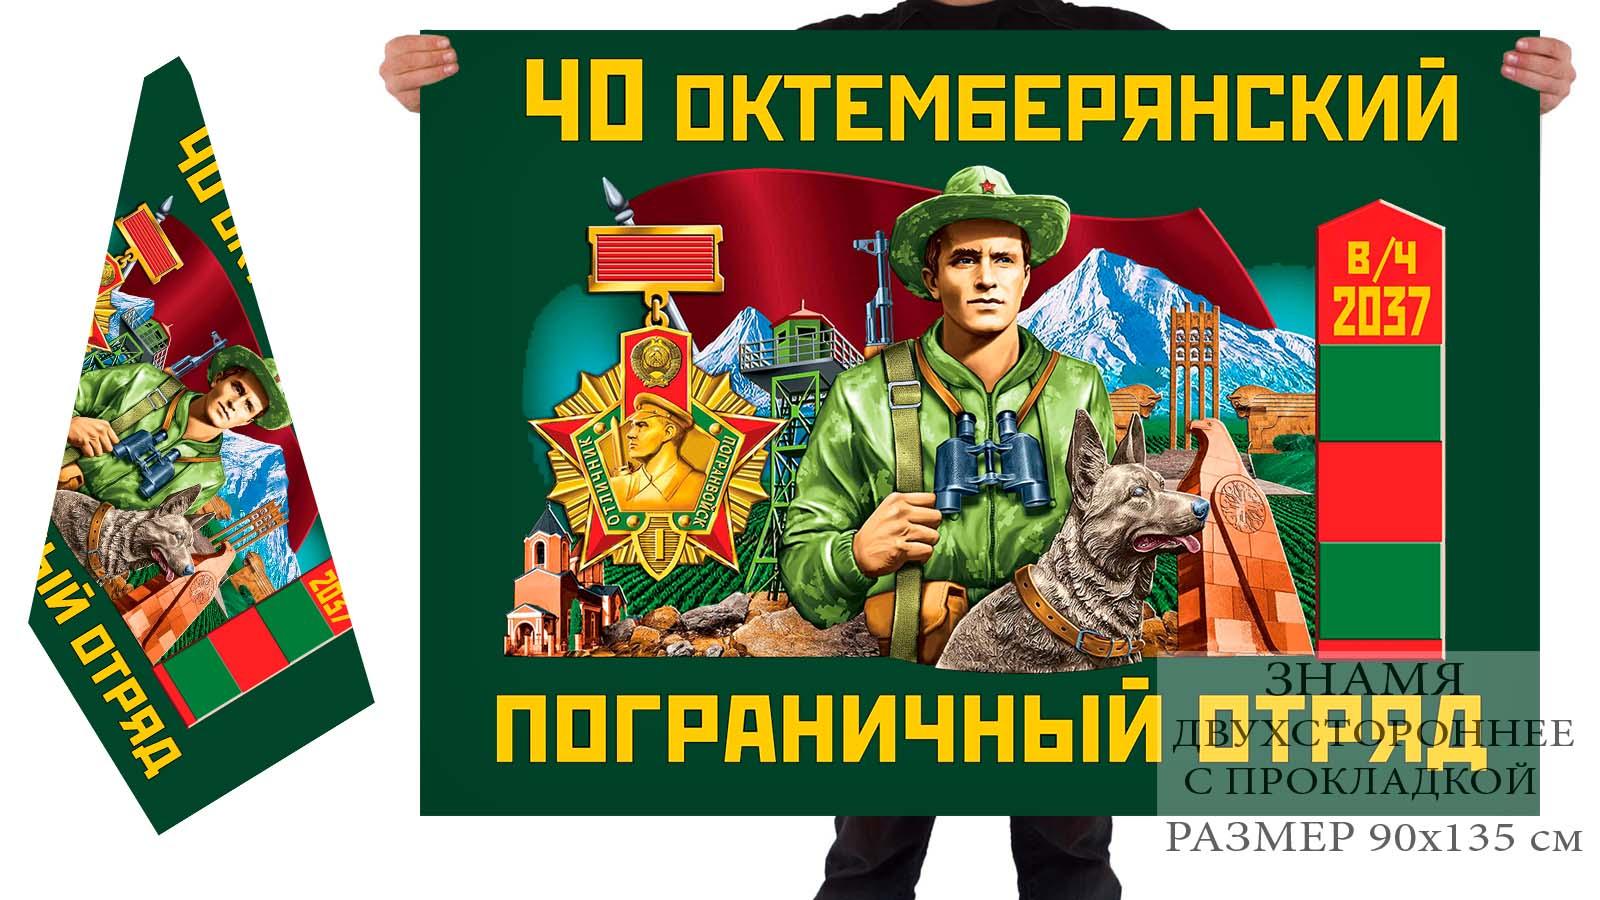 Двусторонний флаг 40 Октемберянского погранотряда имени А.И. Микояна